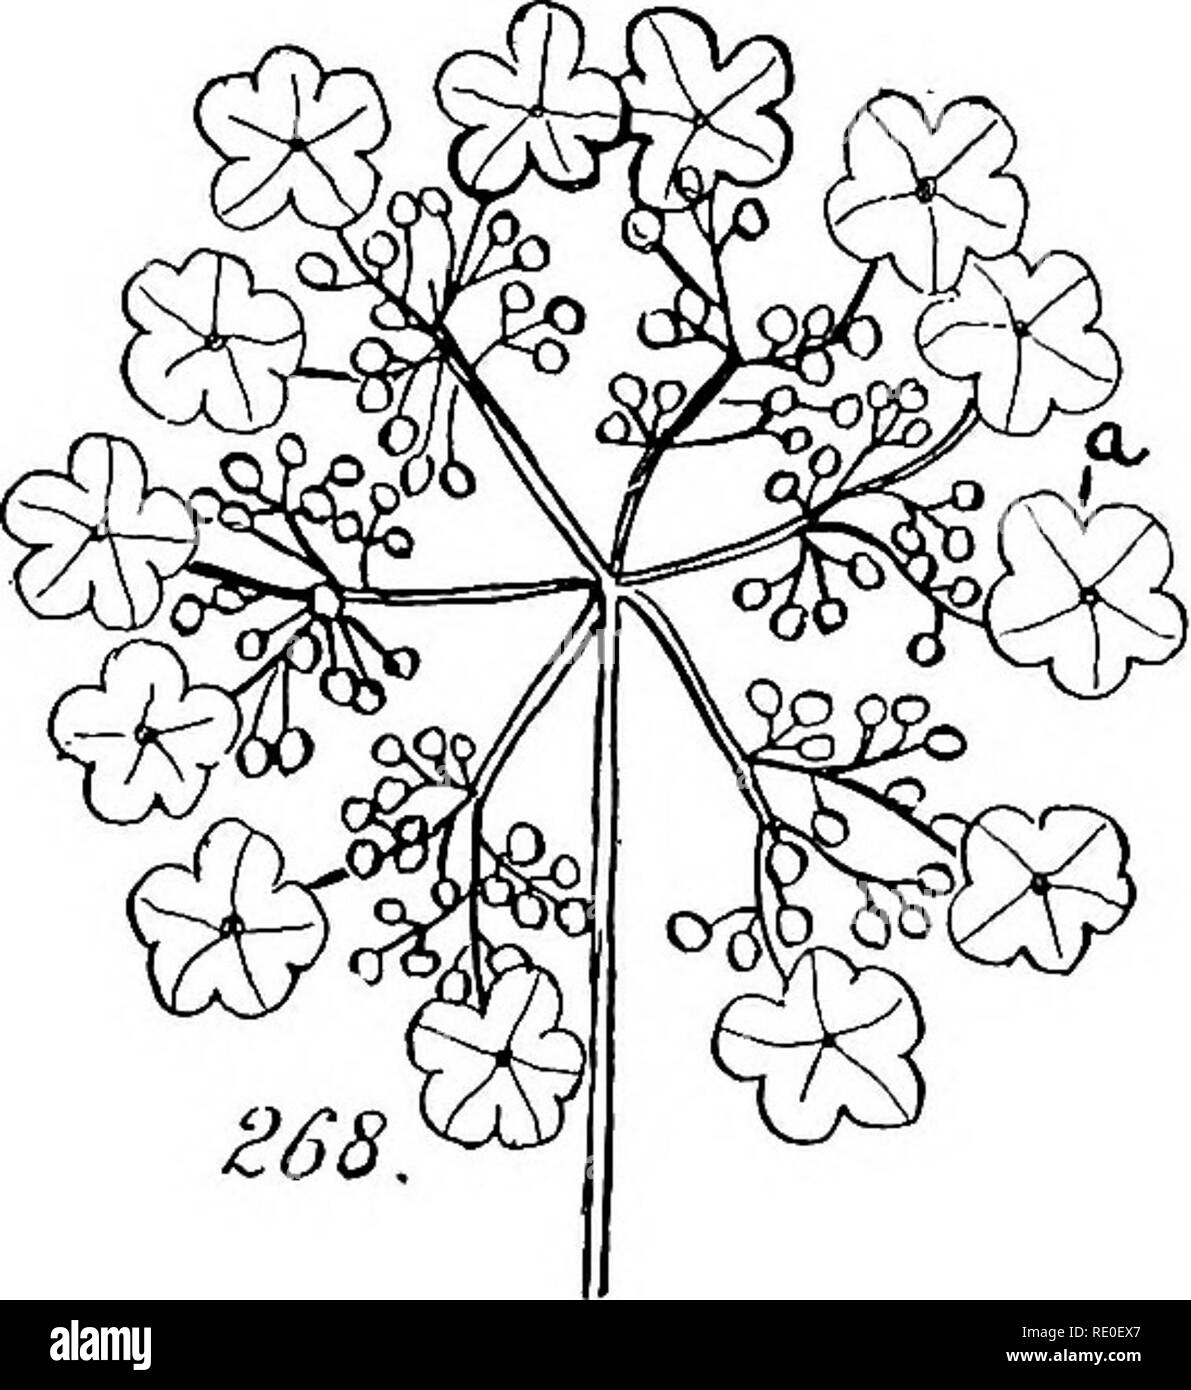 Un manuel de botanique structurels ; un manuel introductif